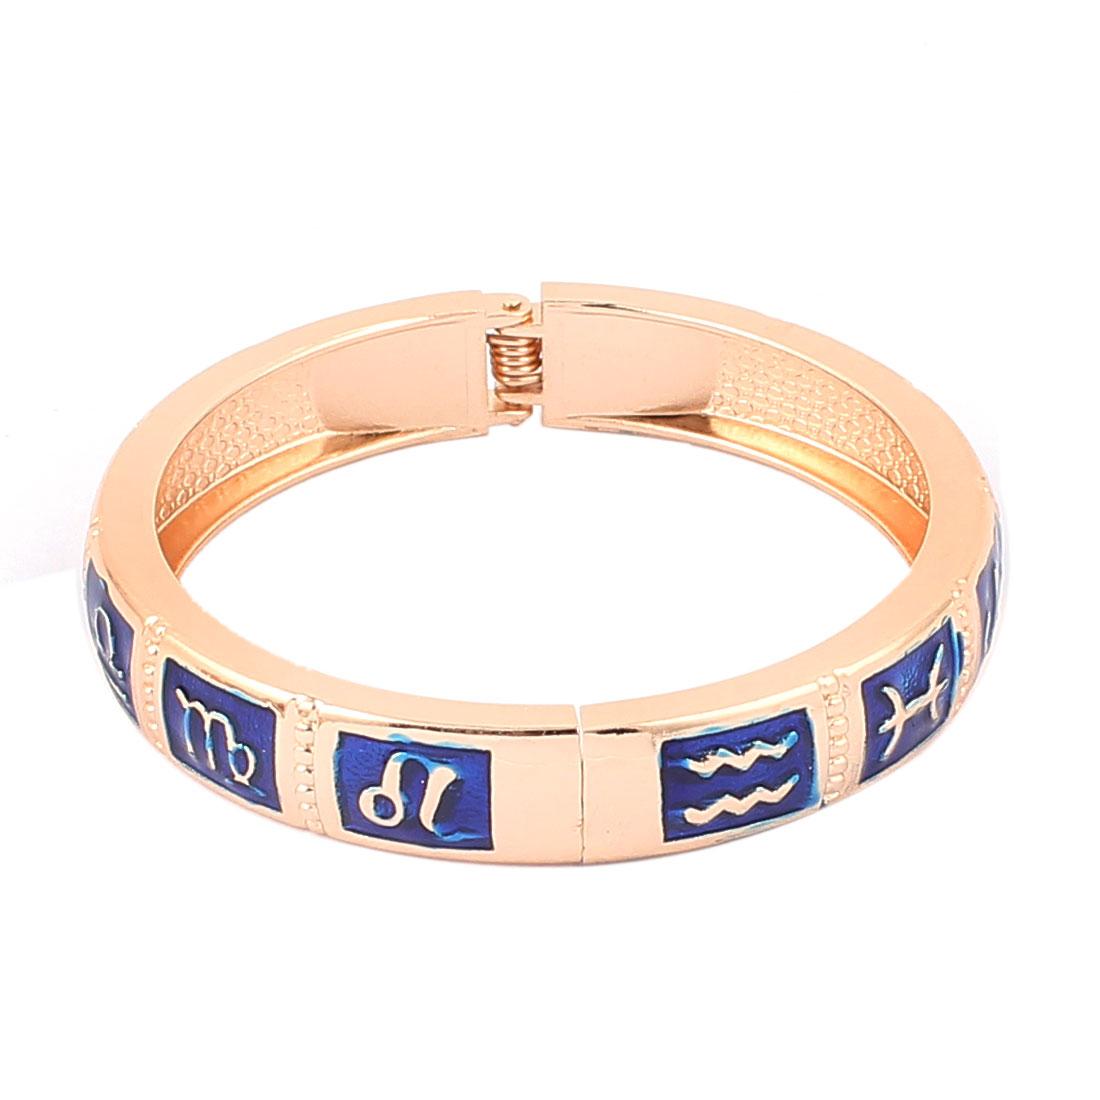 "Round Wrist Gold Tone Metal 12 Constellations Pattern Bracelet Blue Enamel 0.4"" Width"